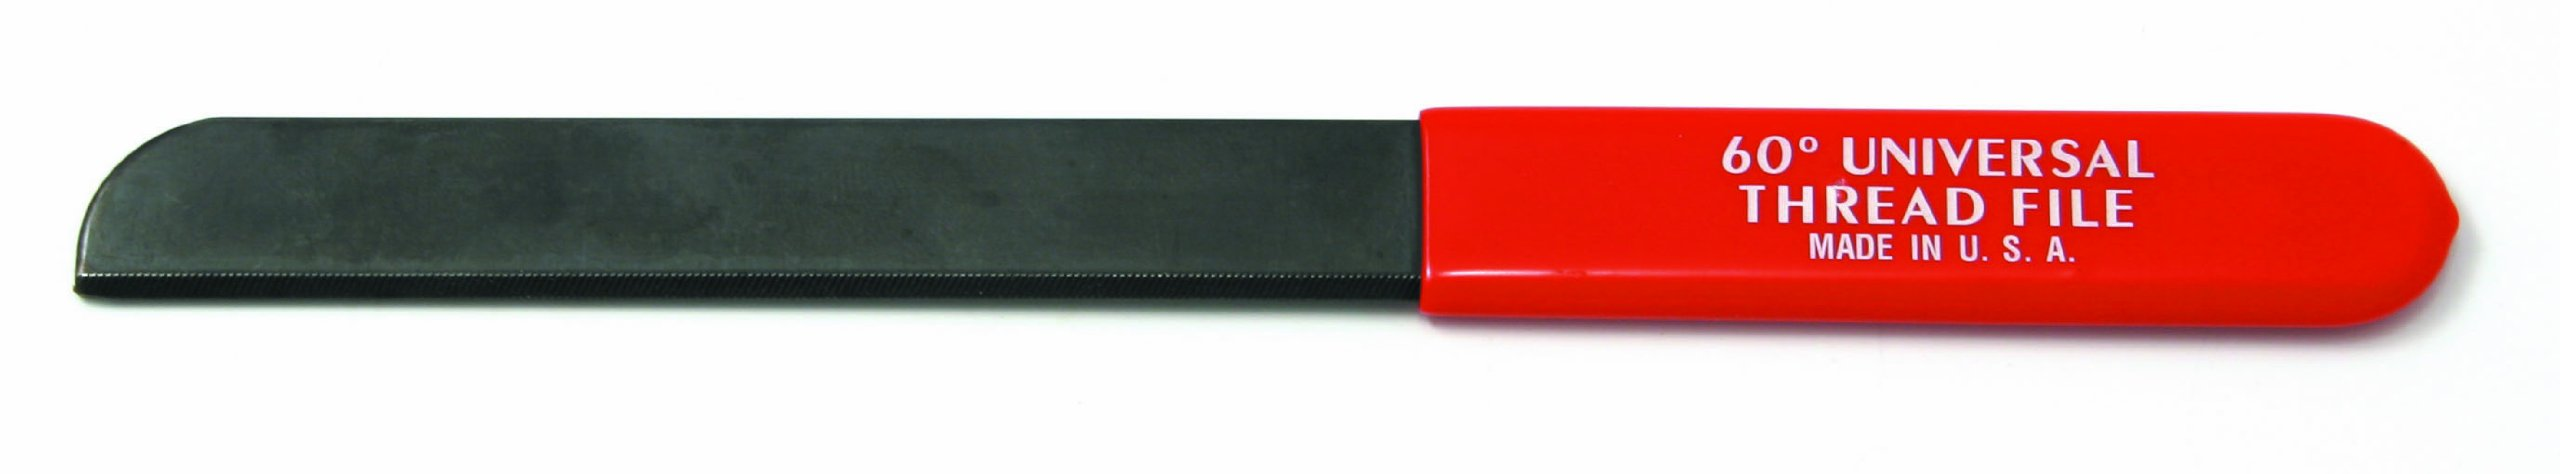 CTA Tools 8237 60-Degree Universal  Thread Restoring File by CTA Tools (Image #1)